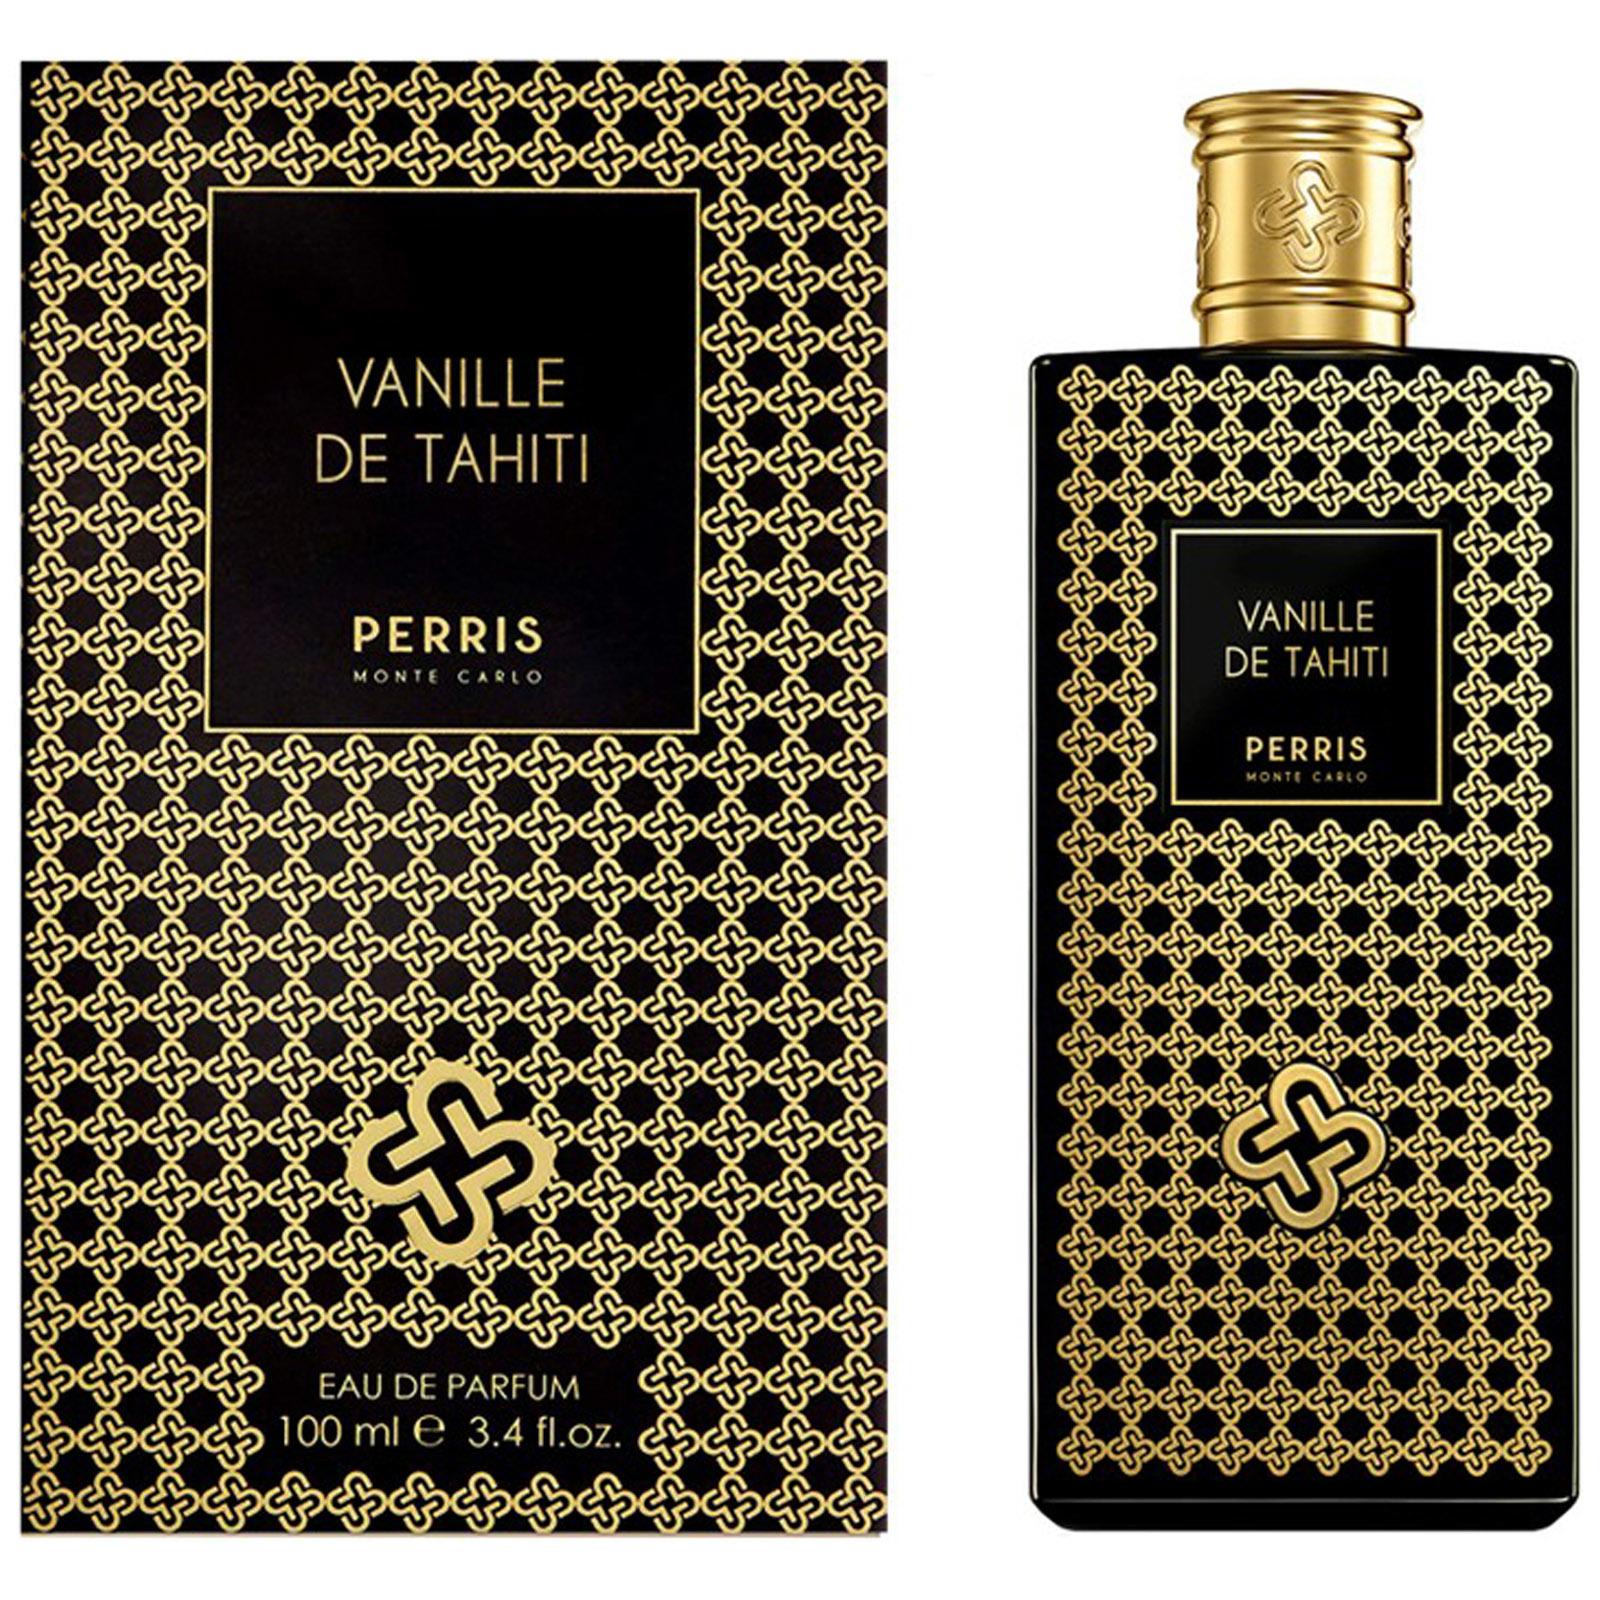 Perris Monte Carlo Vanille de Tahiti EDP